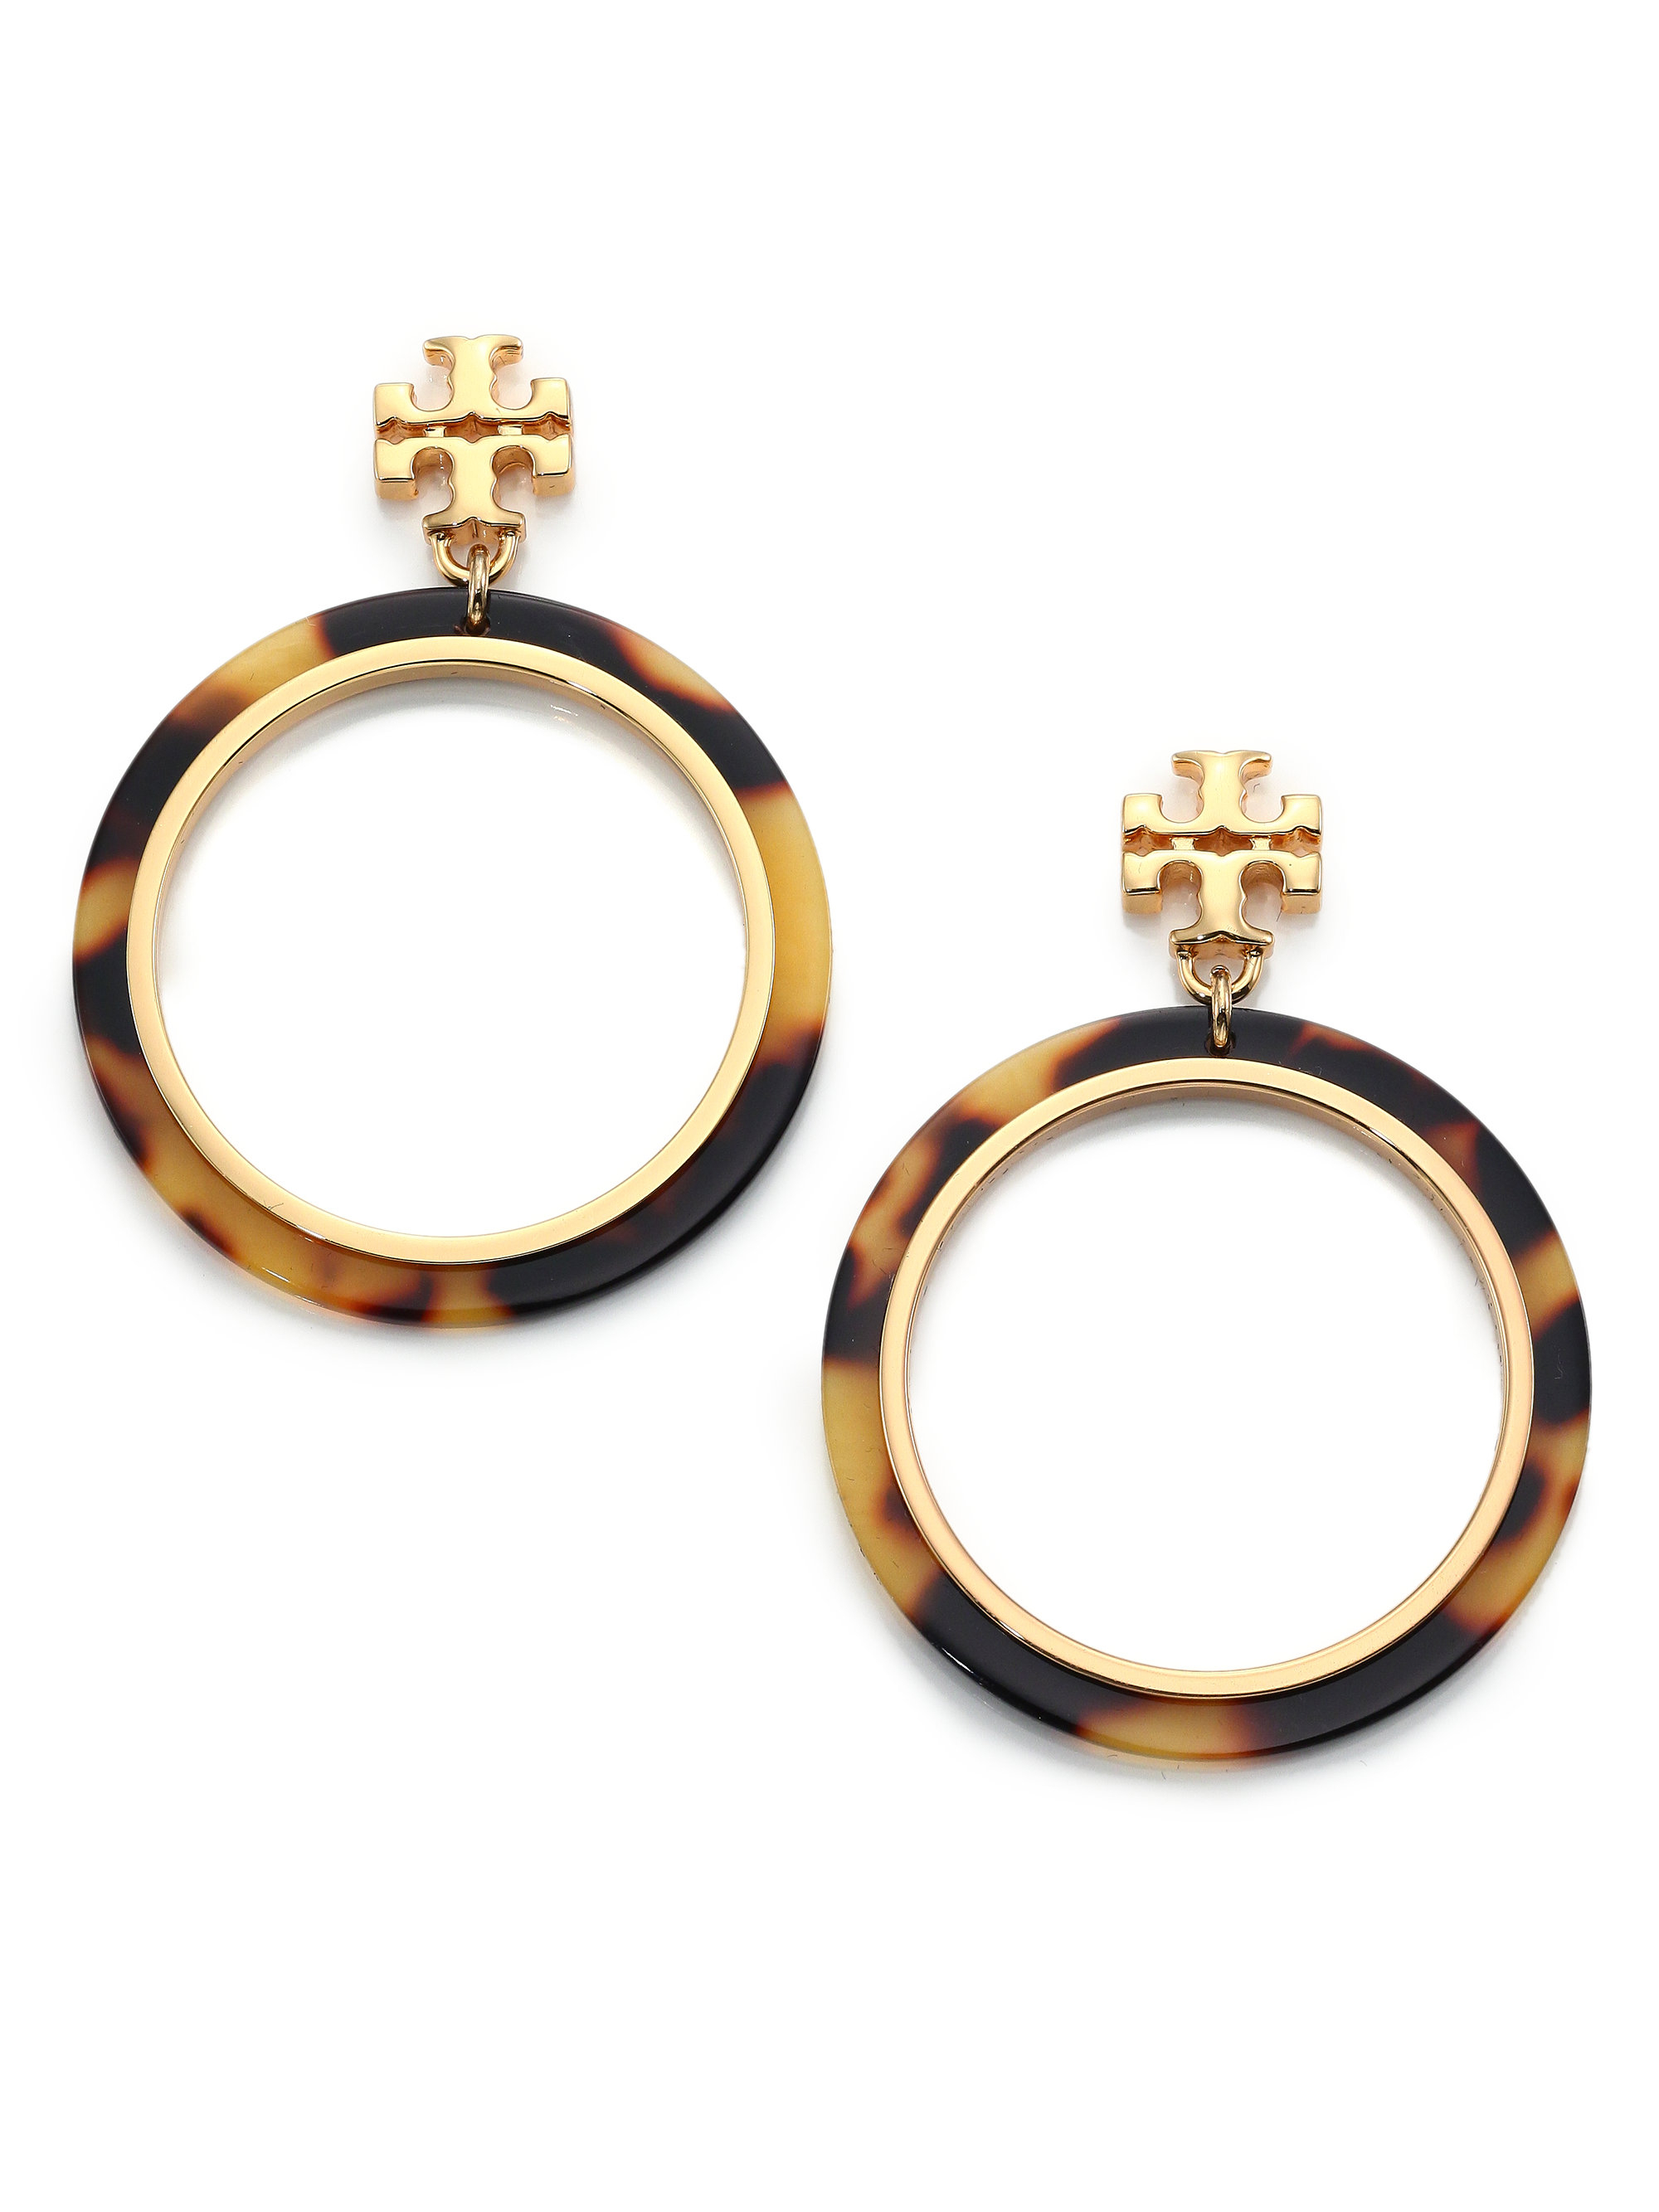 6f3e7053b Tory Burch Tortoise-Print Circular Drop Earrings in Metallic - Lyst